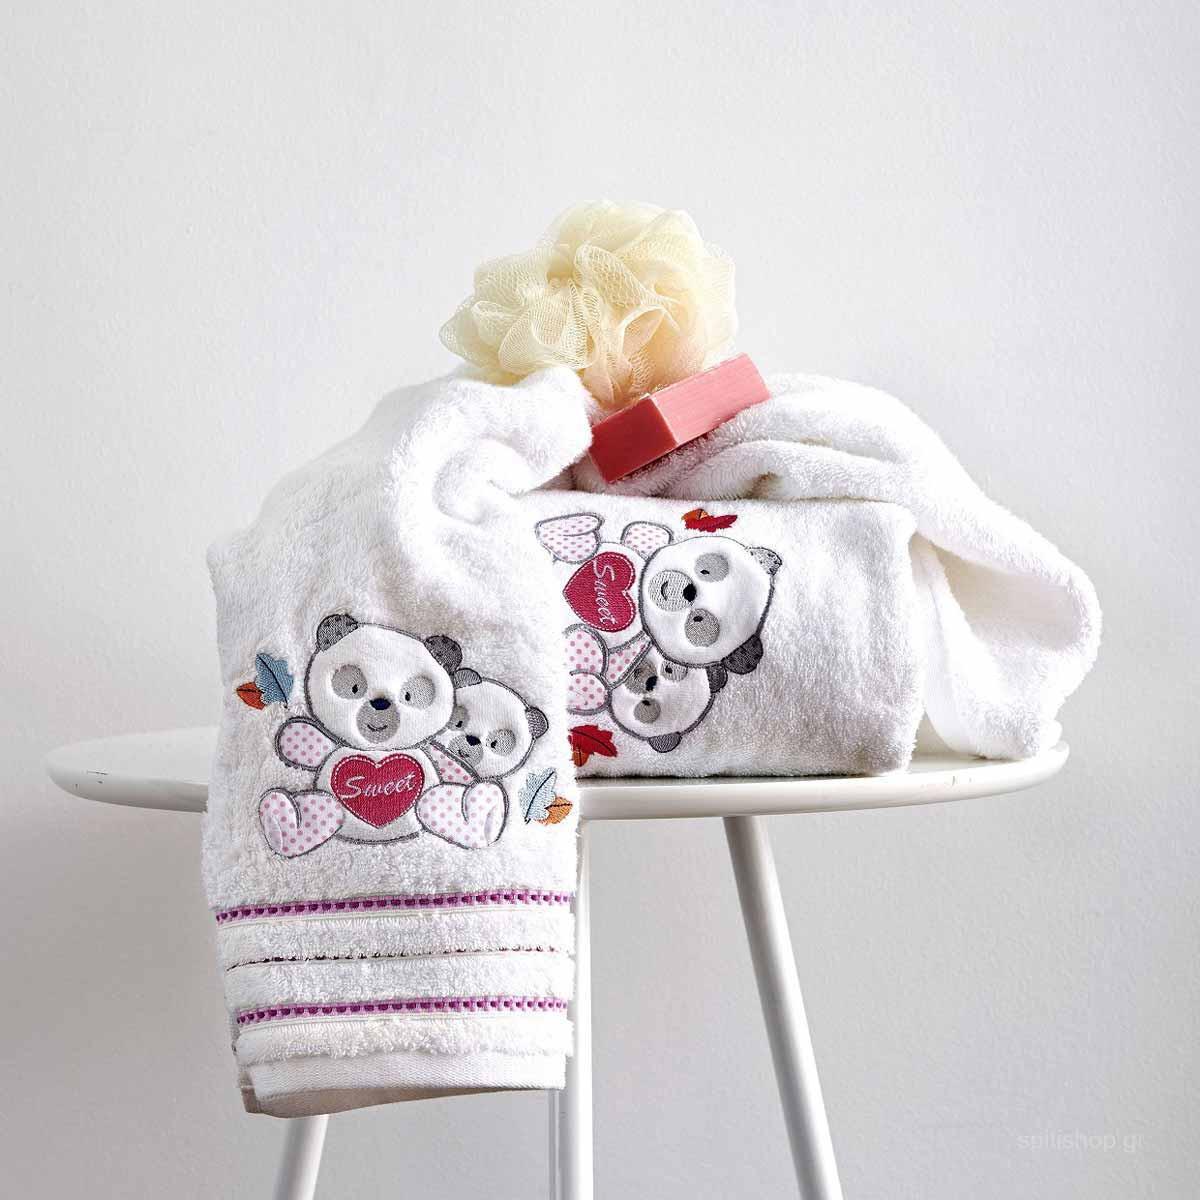 8878e80c562 Βρεφικές Πετσέτες (Σετ 2τμχ) Sb Home Baby Panda Pink | Spitishop.gr